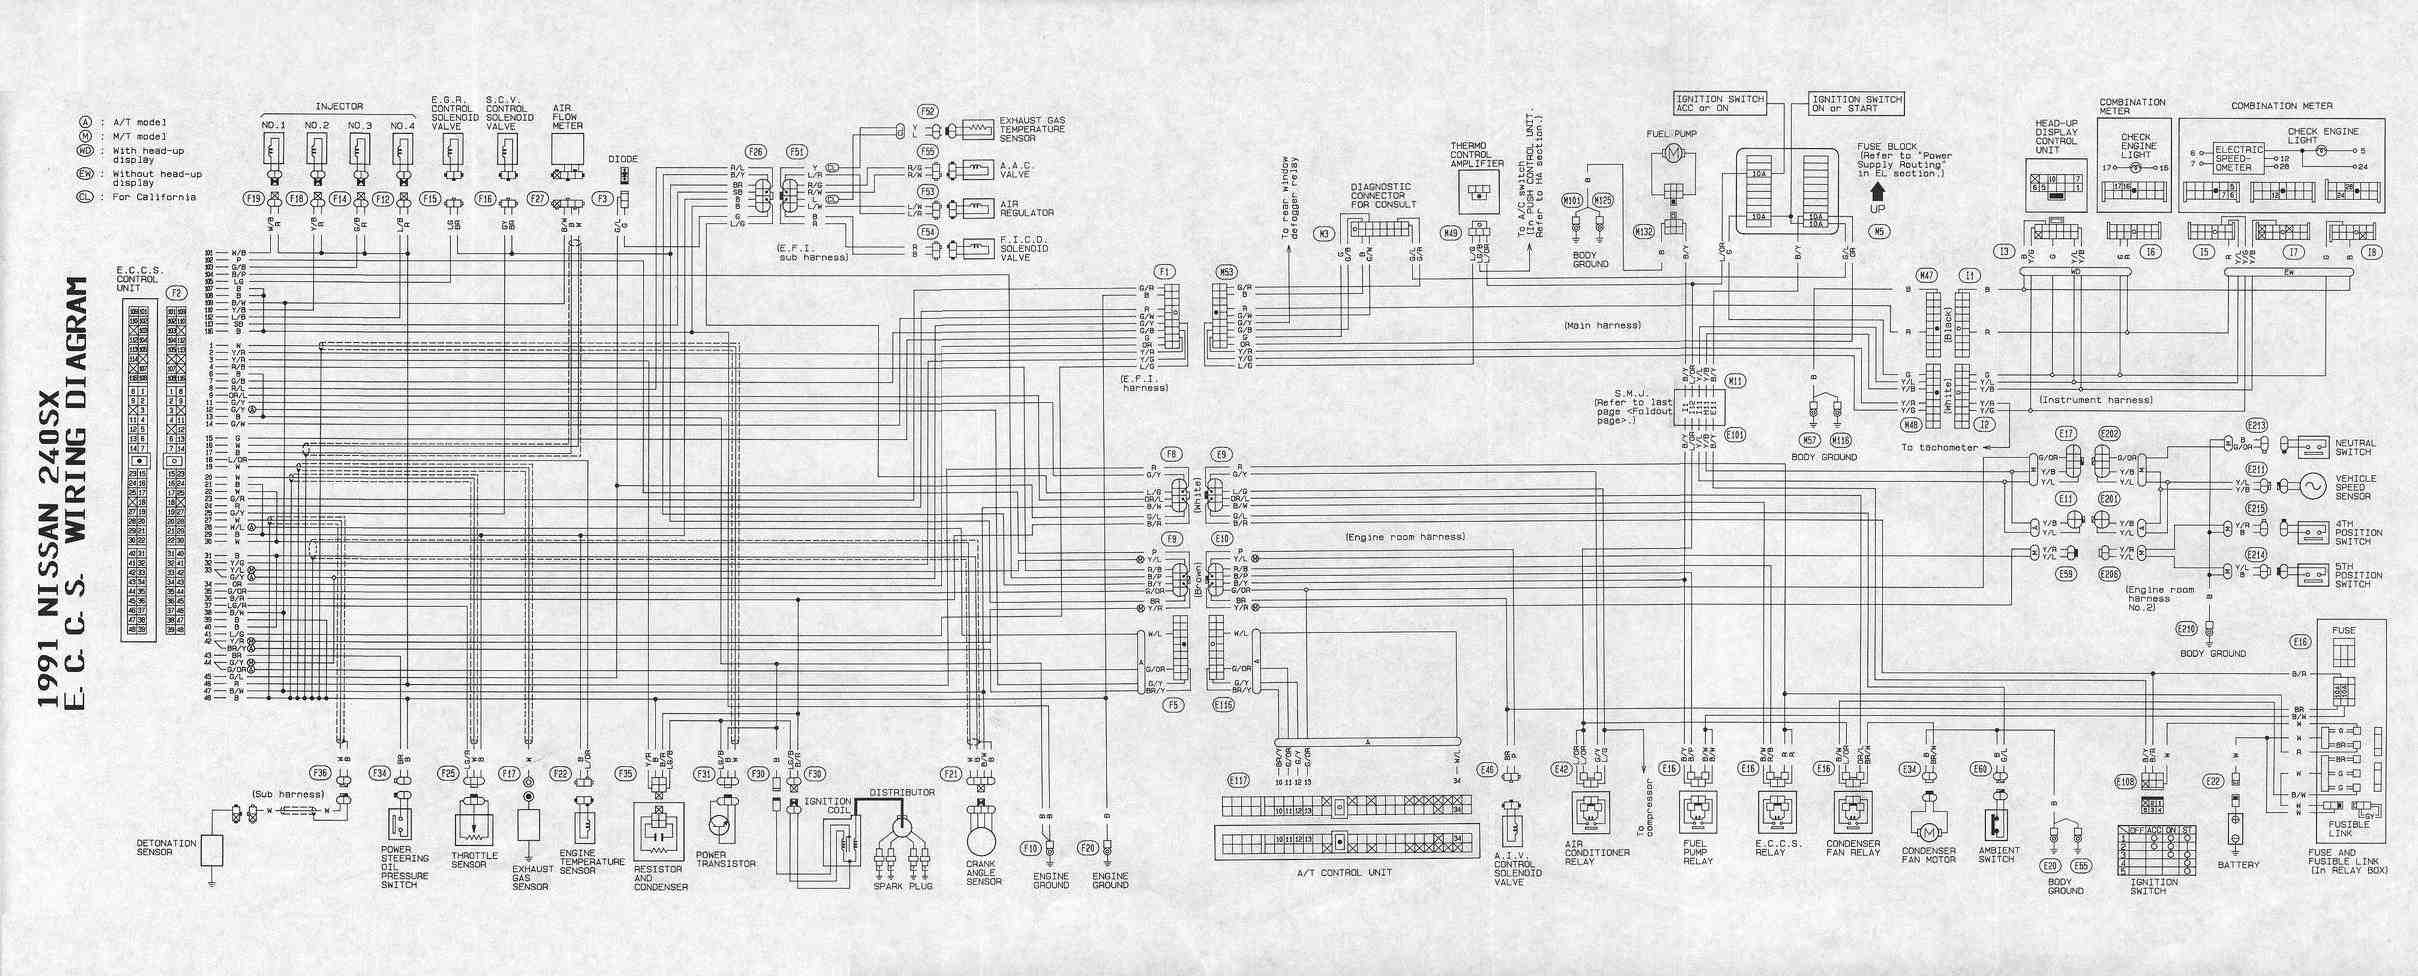 Amusing Wiring Diagram For Safc2 Nissan Ka24e Contemporary - Best ...